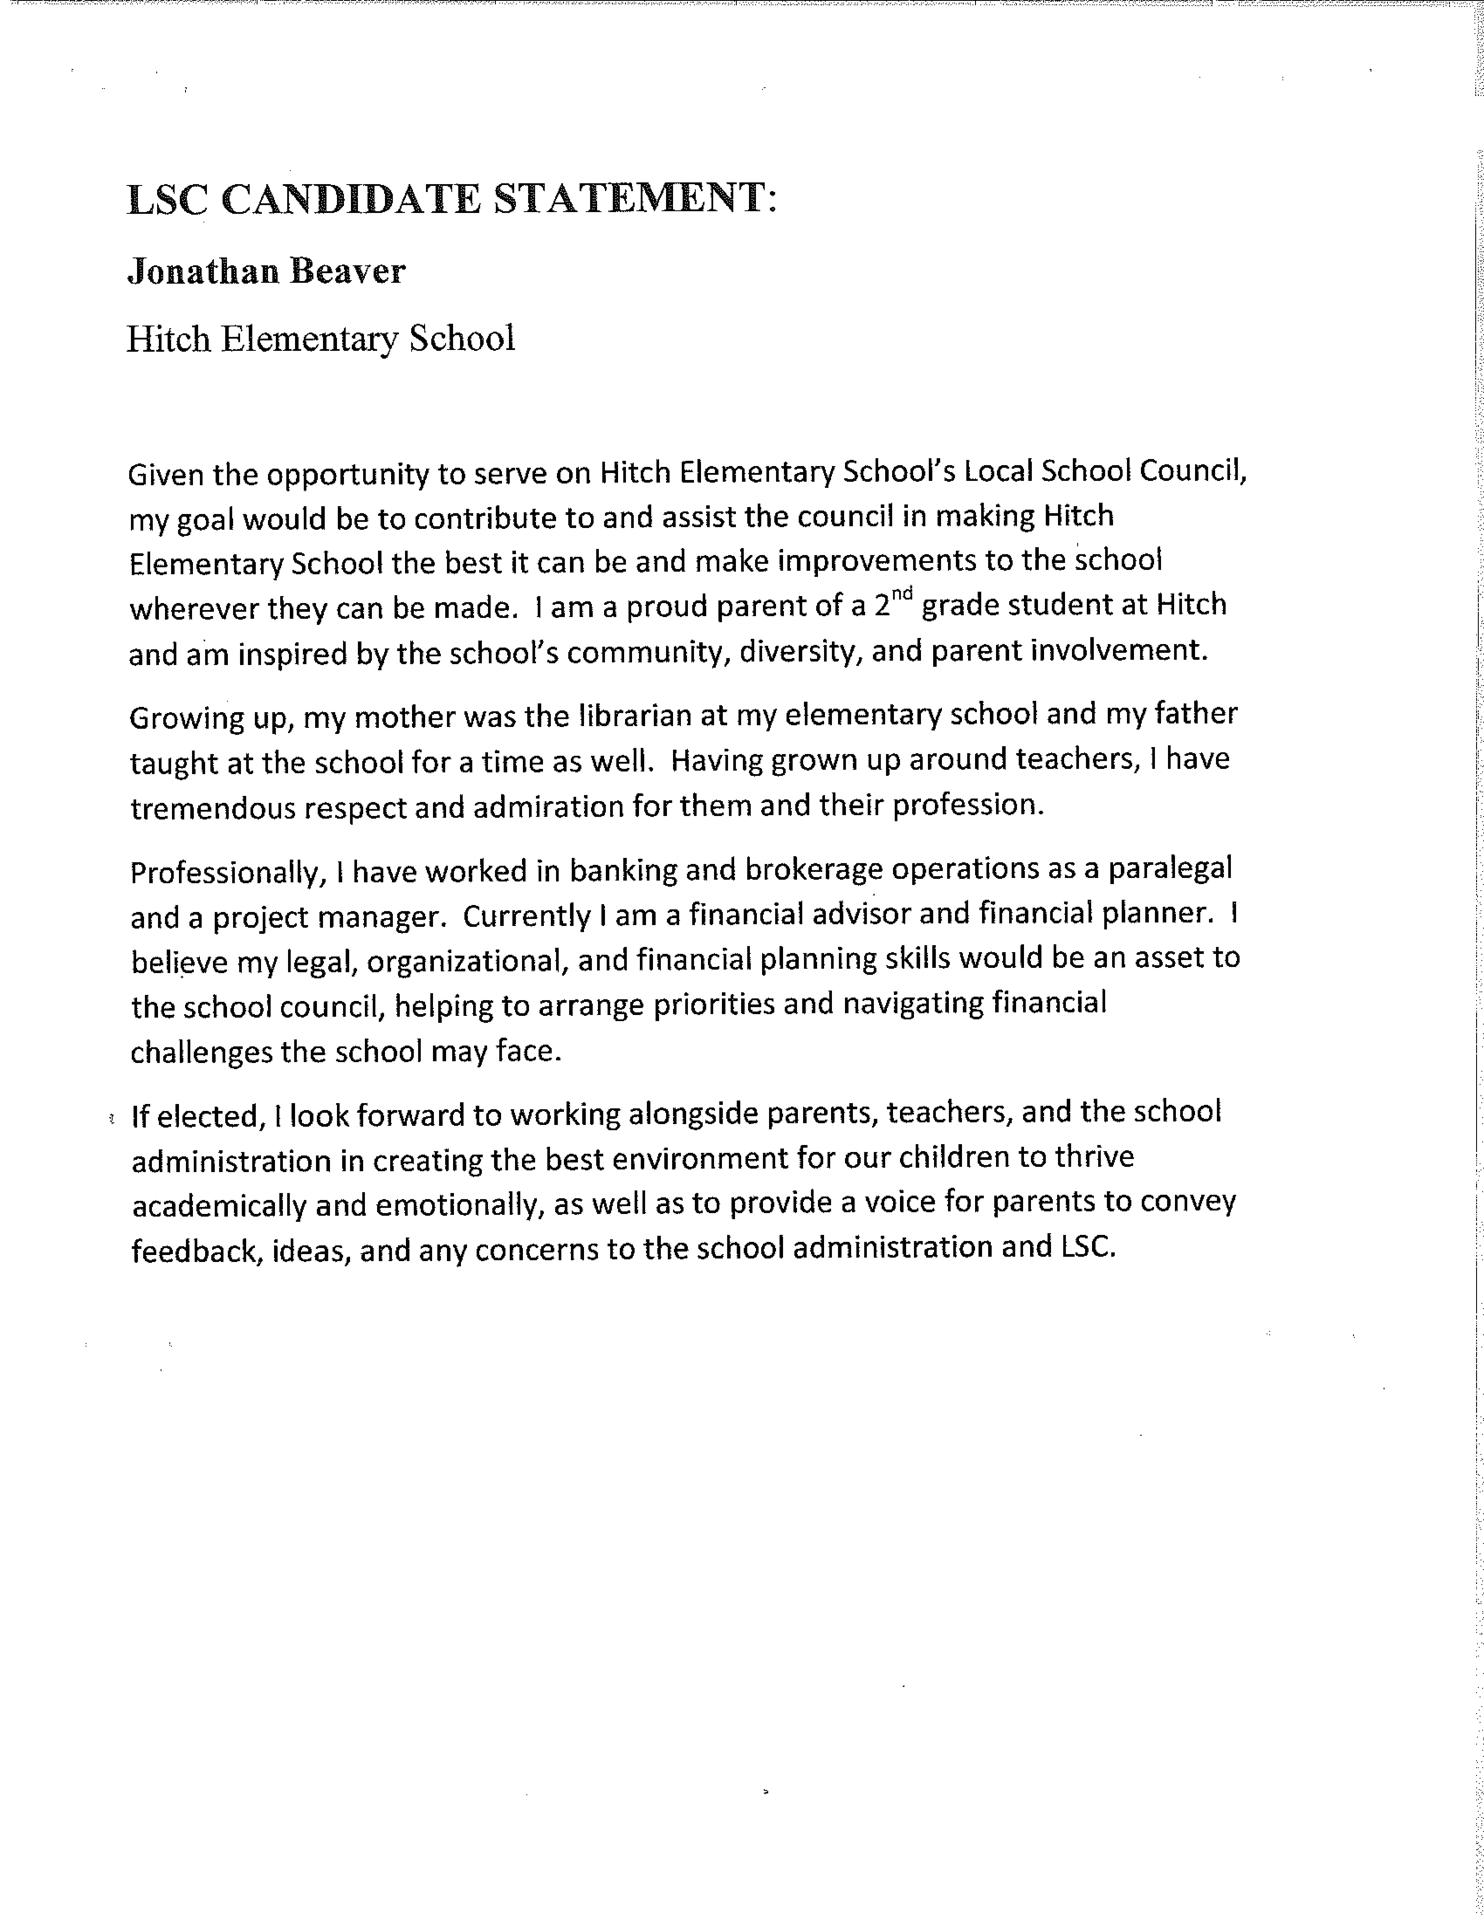 Beaver LSC Statement